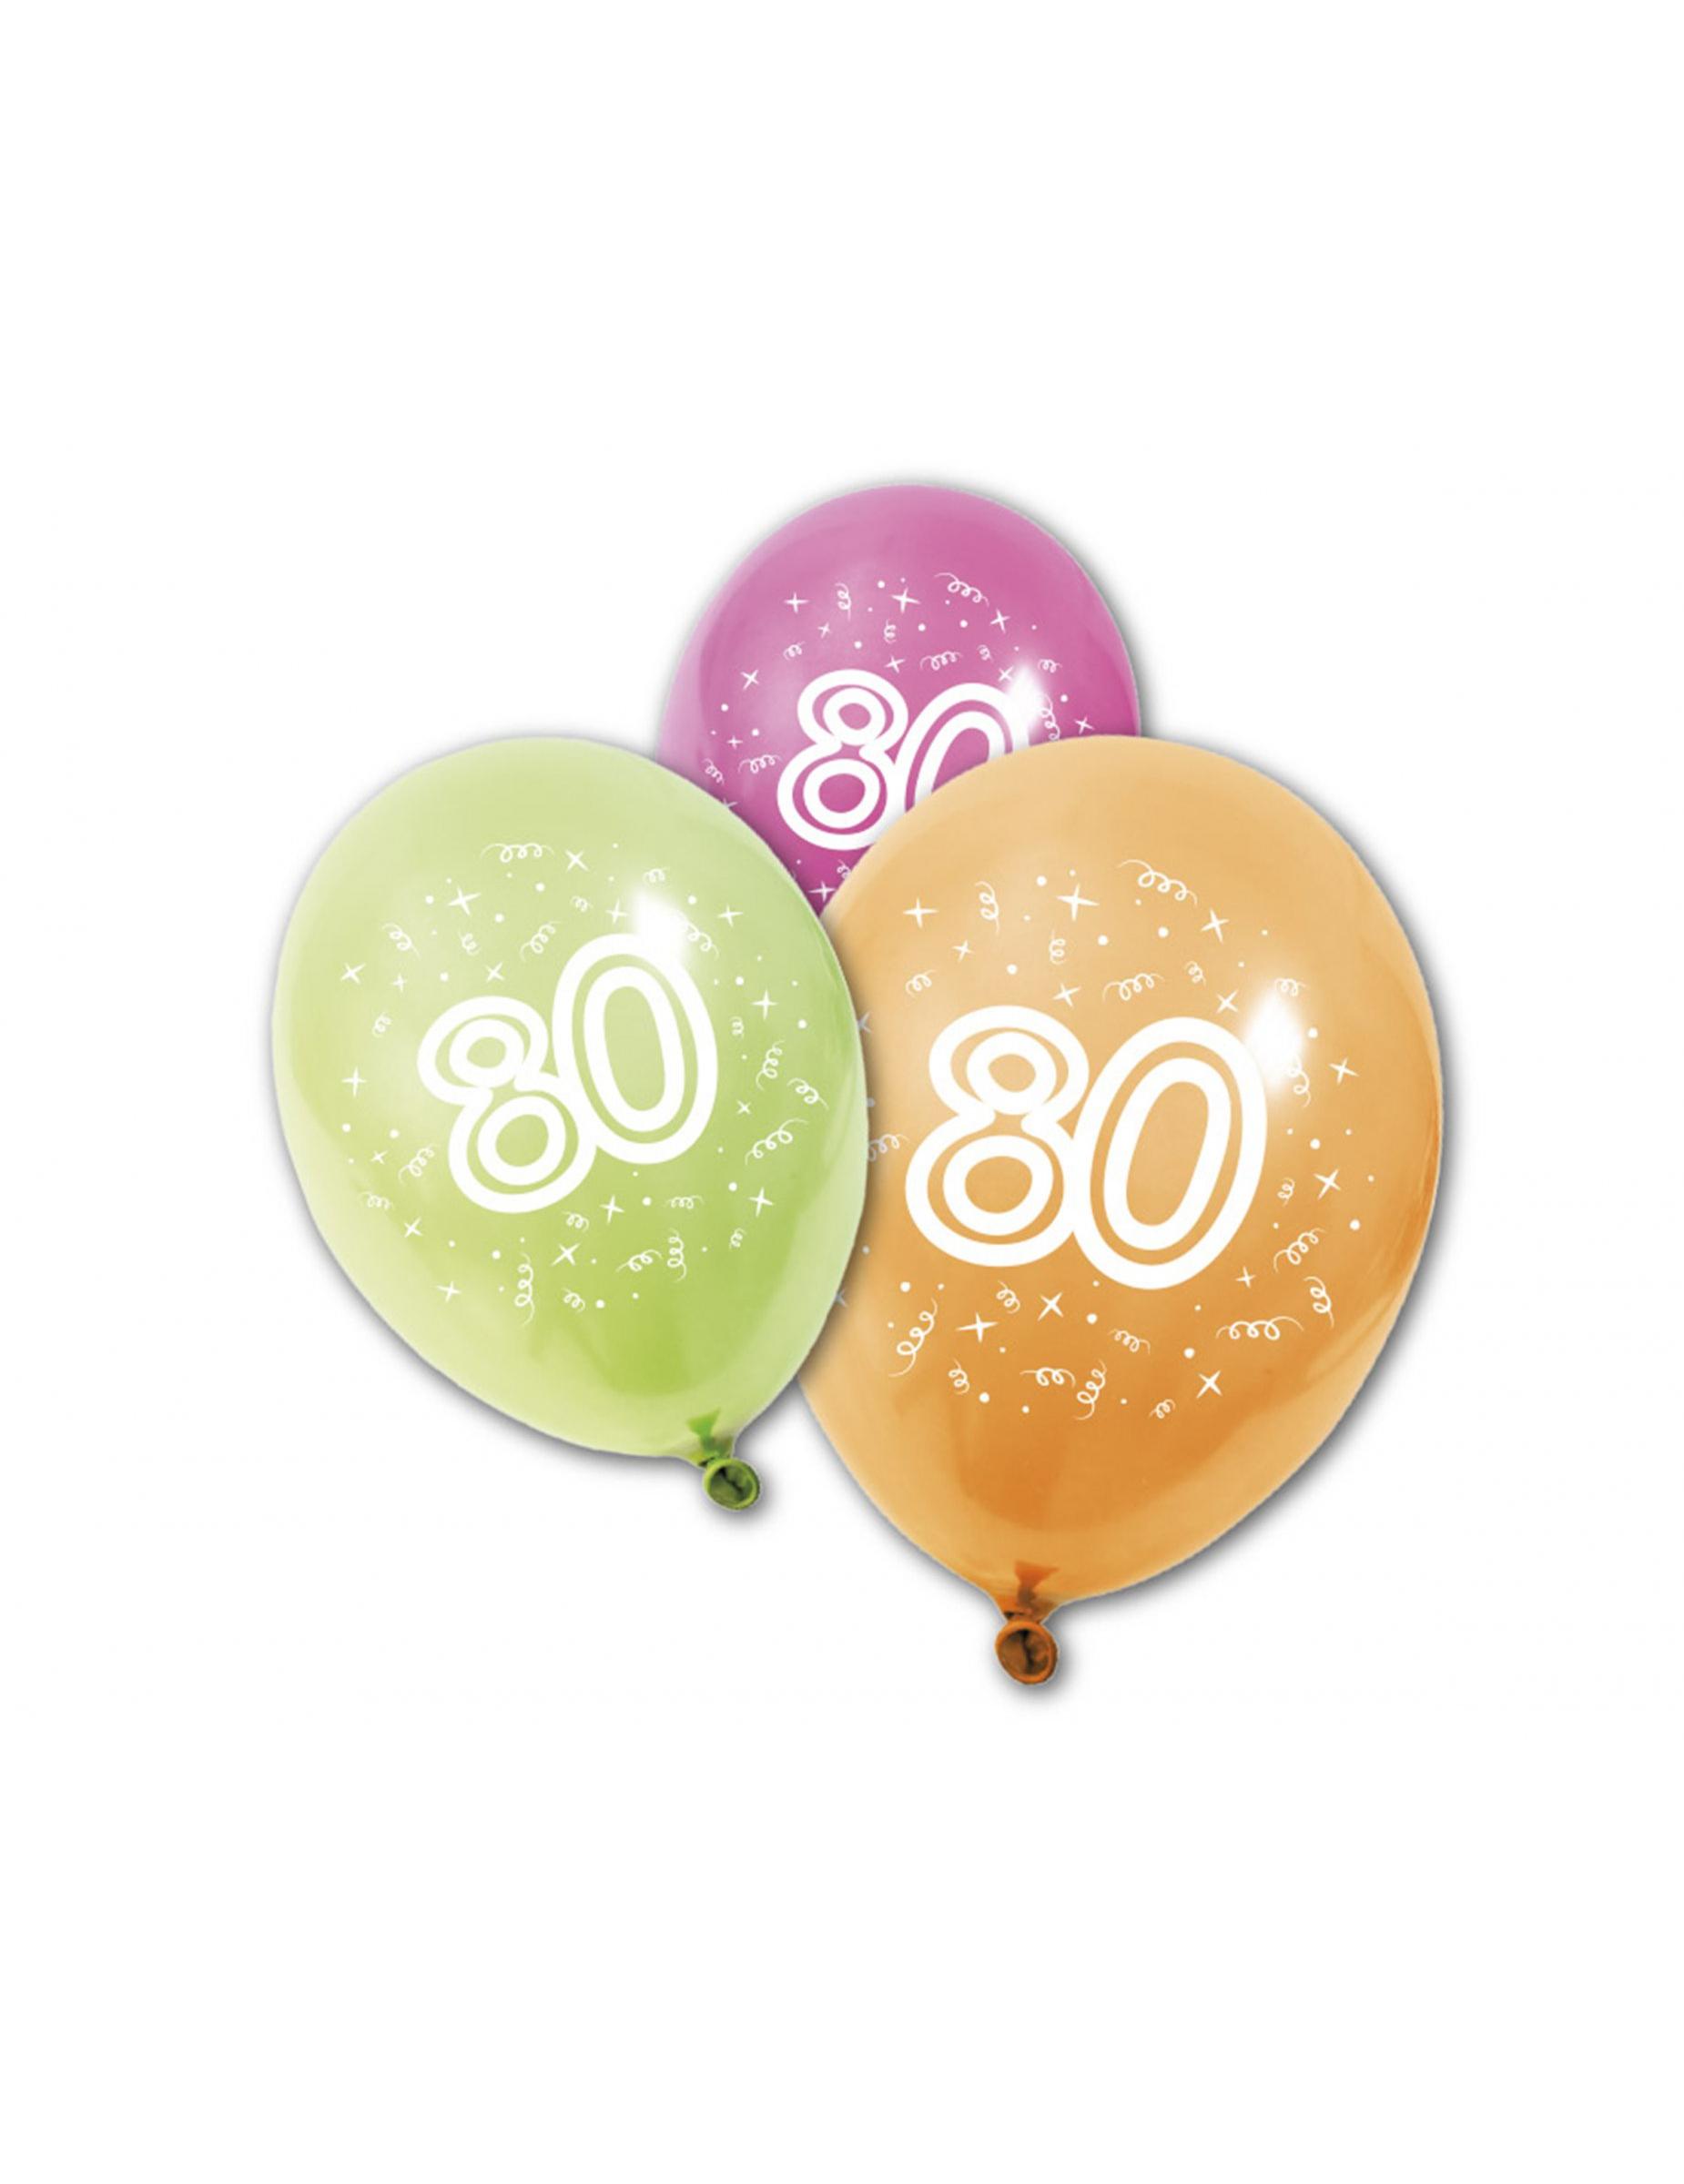 8 Globos De Cumpleanos 80 Anos Decoraciony Disfraces Originales - Globos-cumpleanos